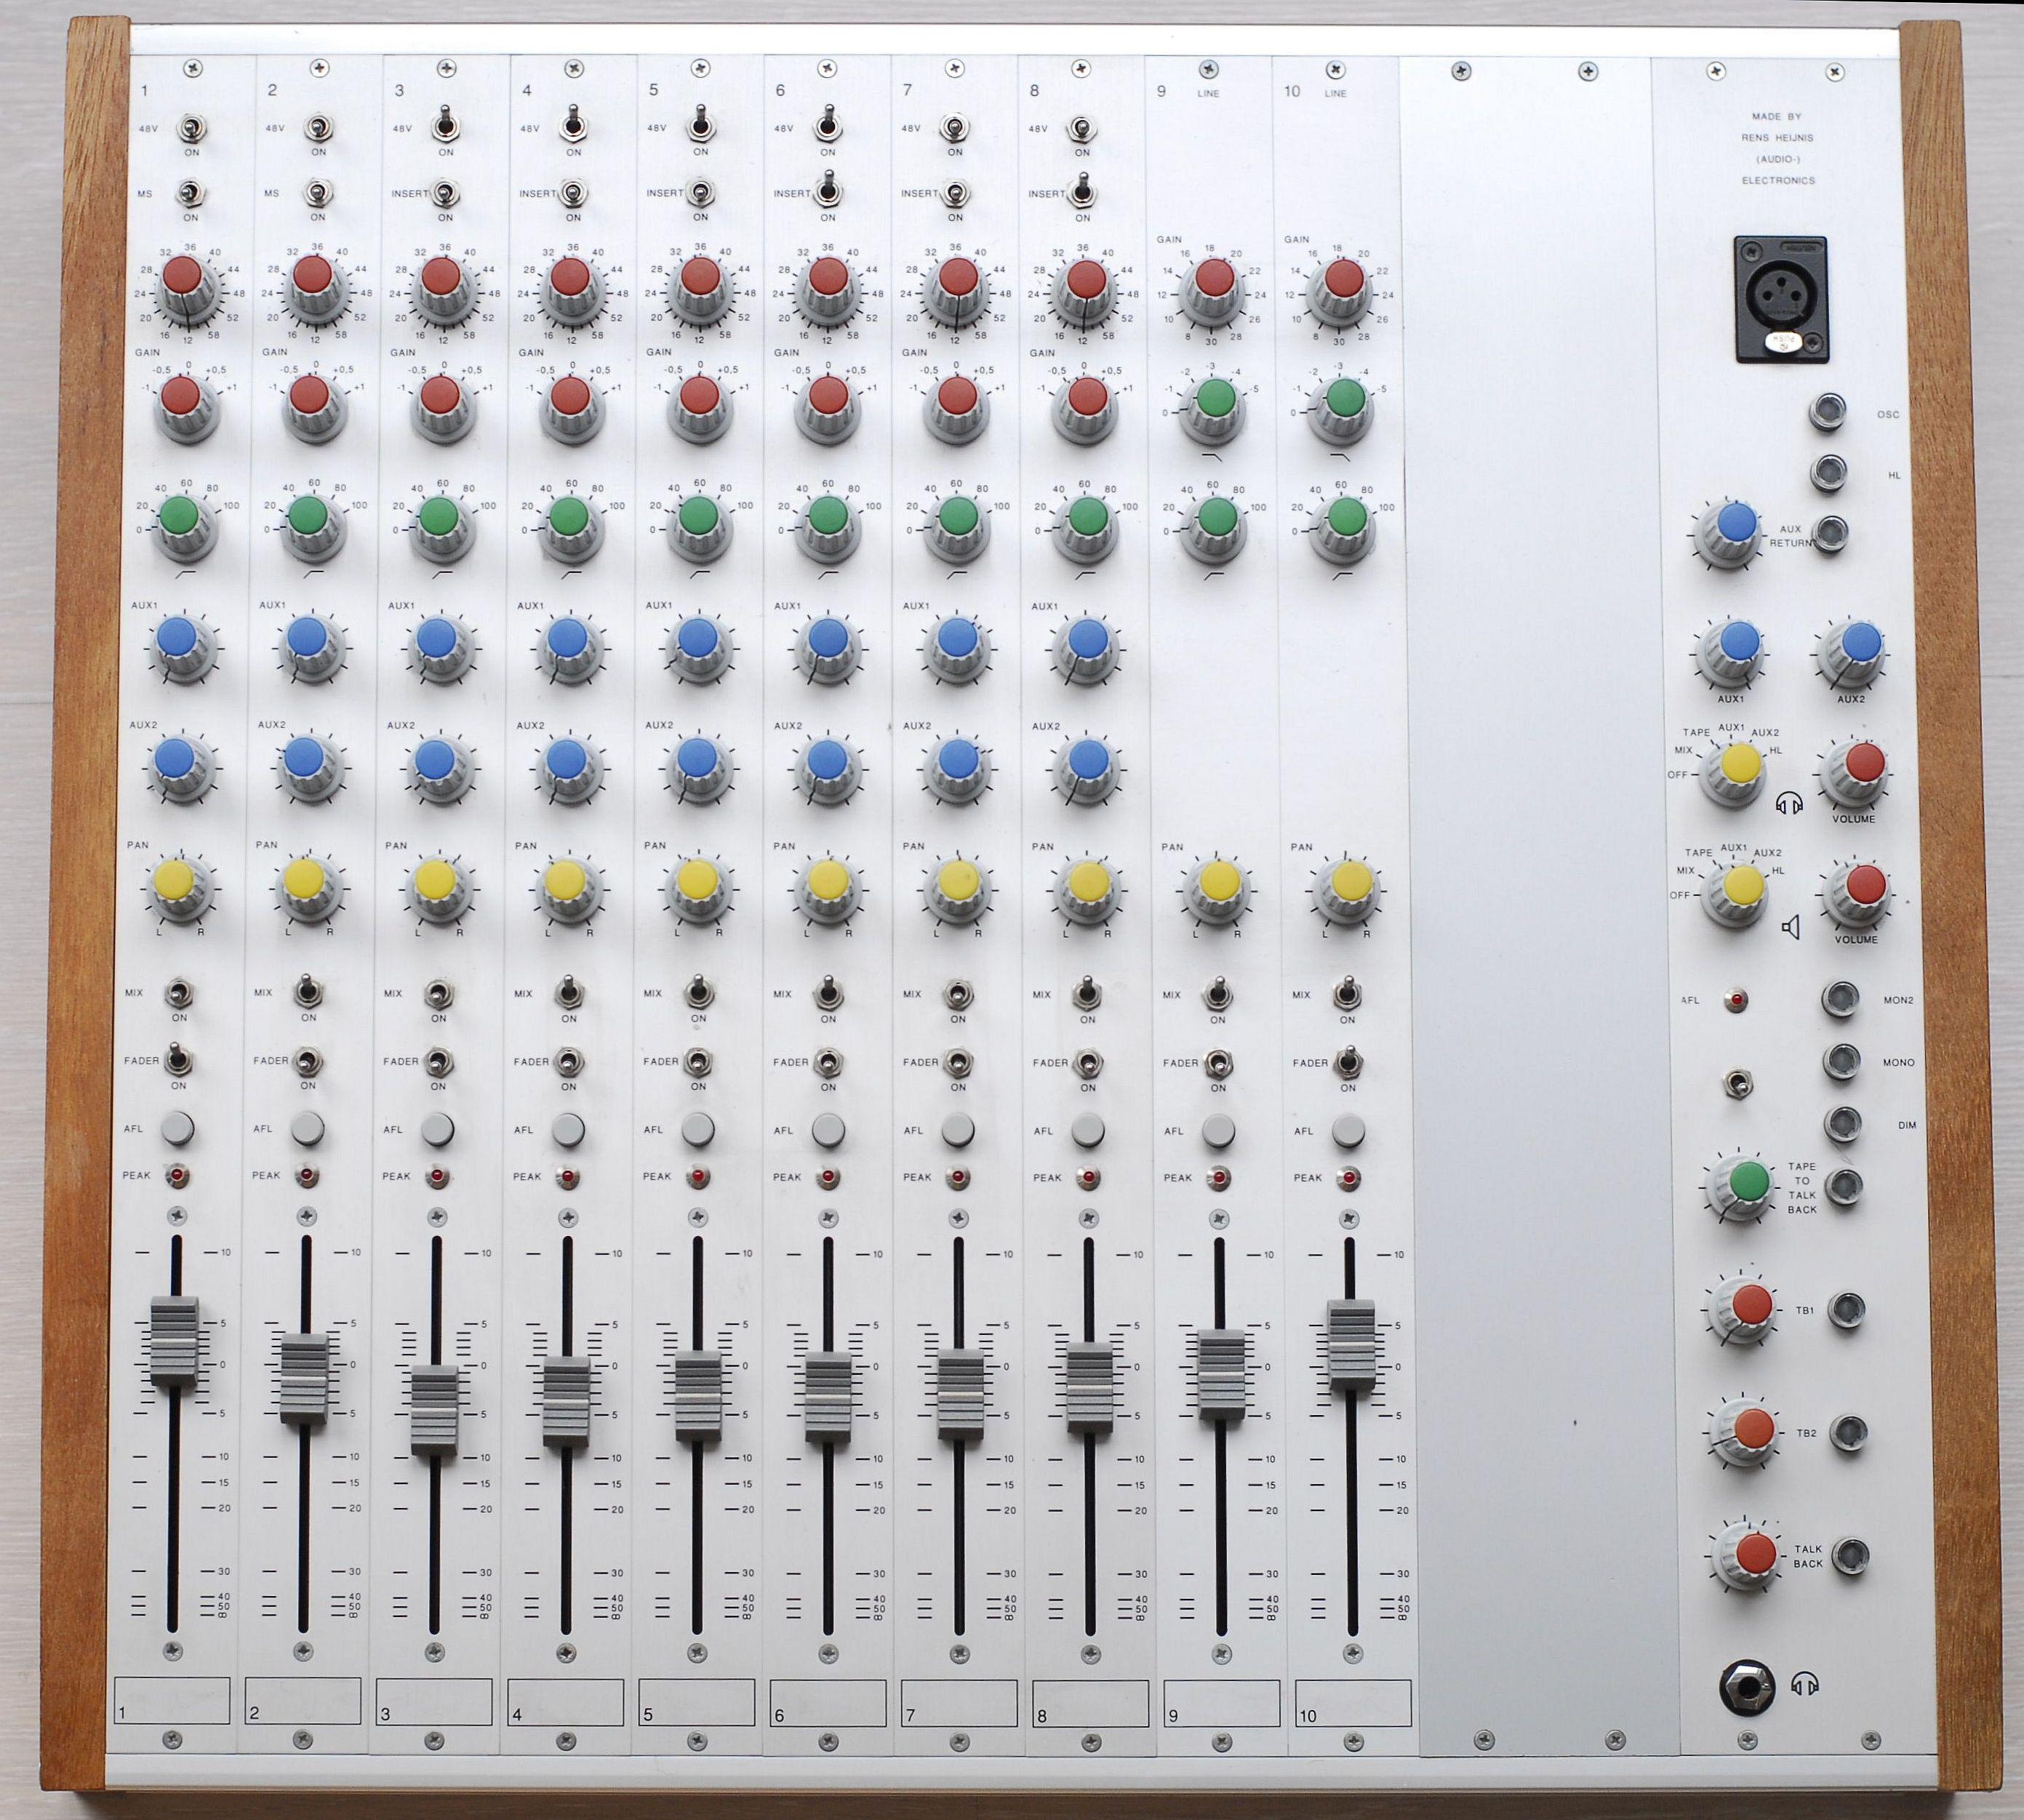 Rens Heijnis Custom Built Audio Equipment 5 Channel Portable Mixer 10 Made